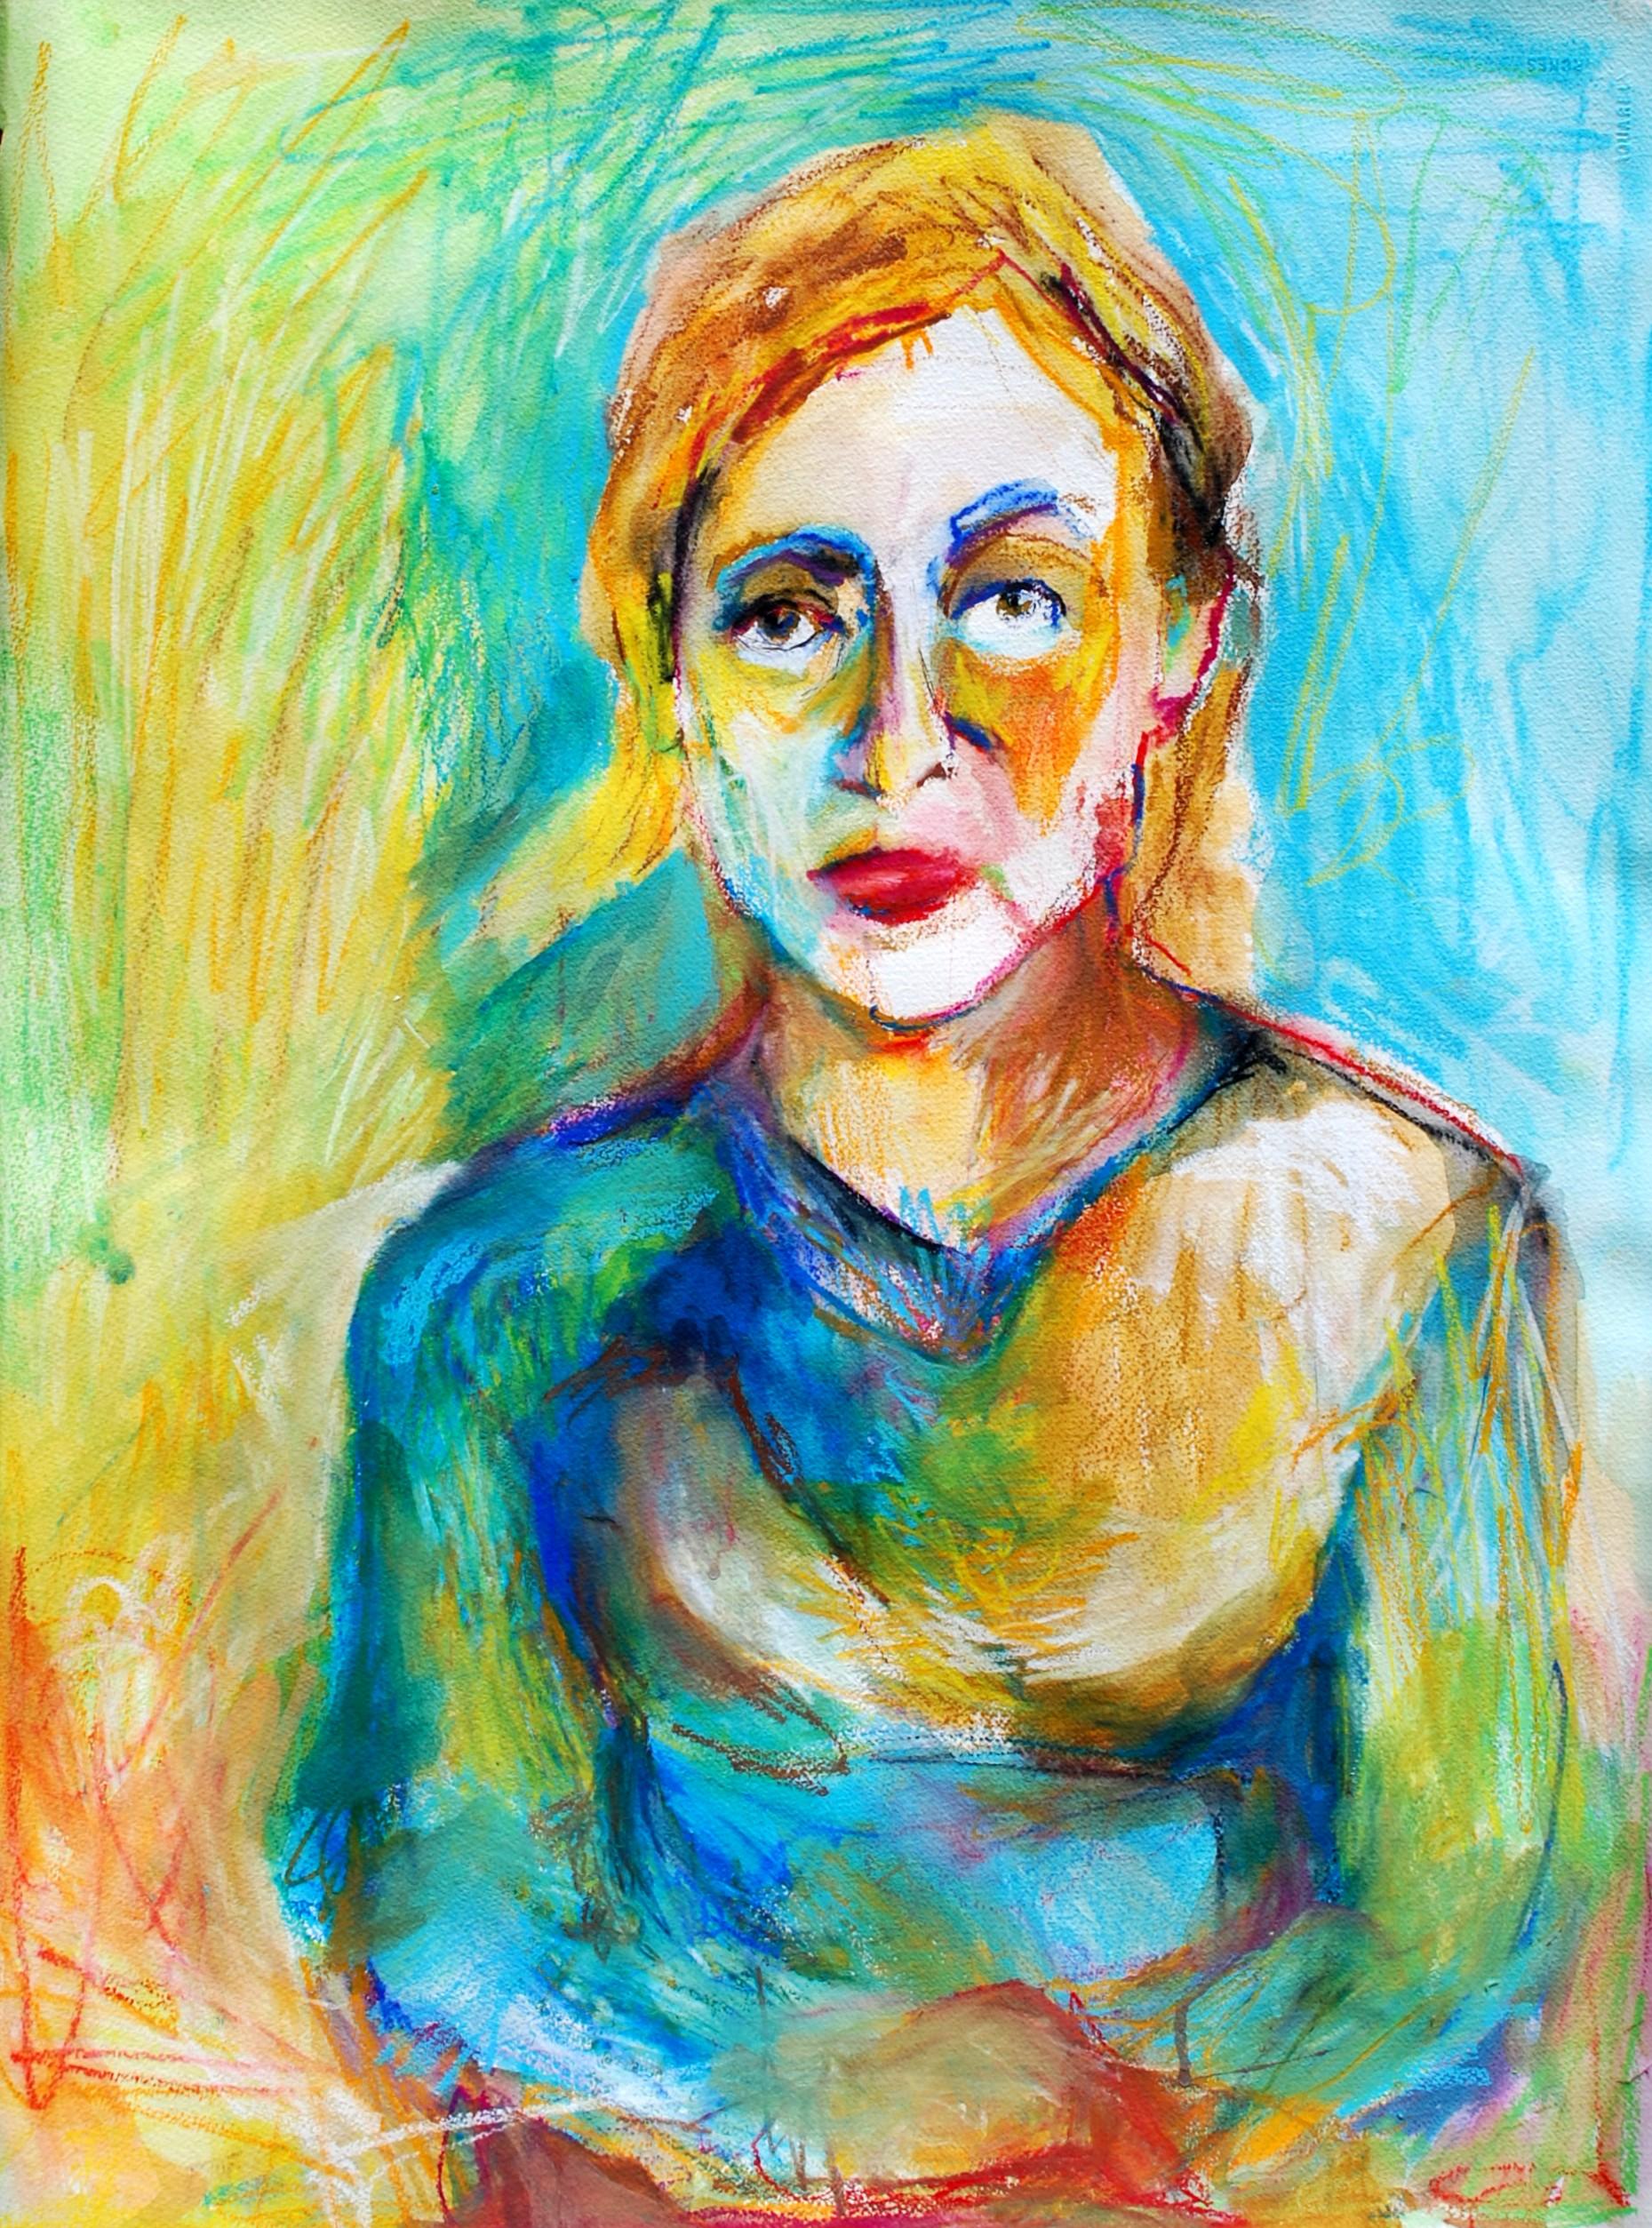 Laura (edited-Pixlr).jpg